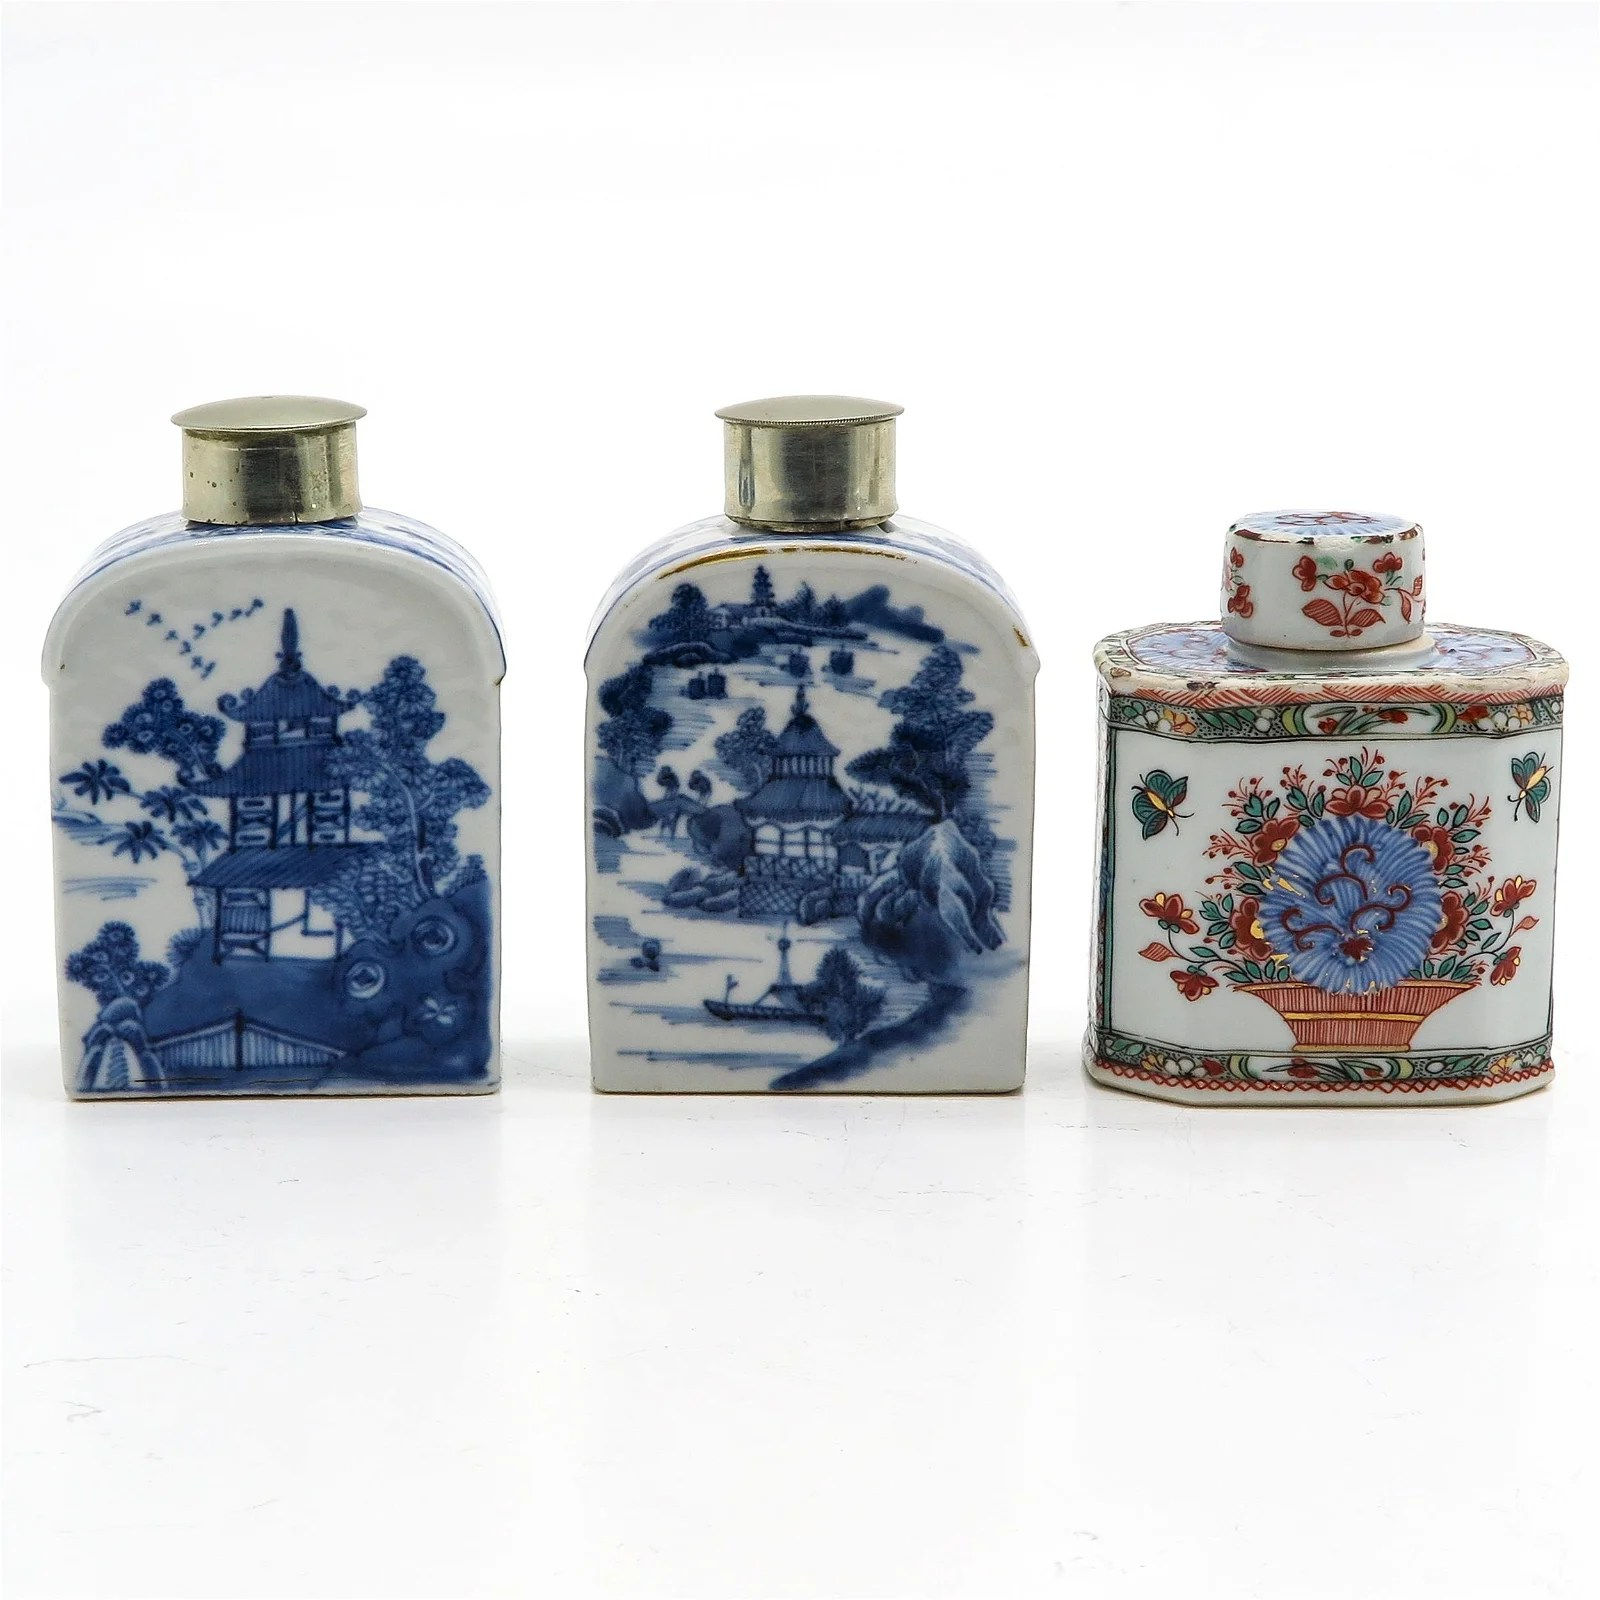 Three Chinese Tea Caddys